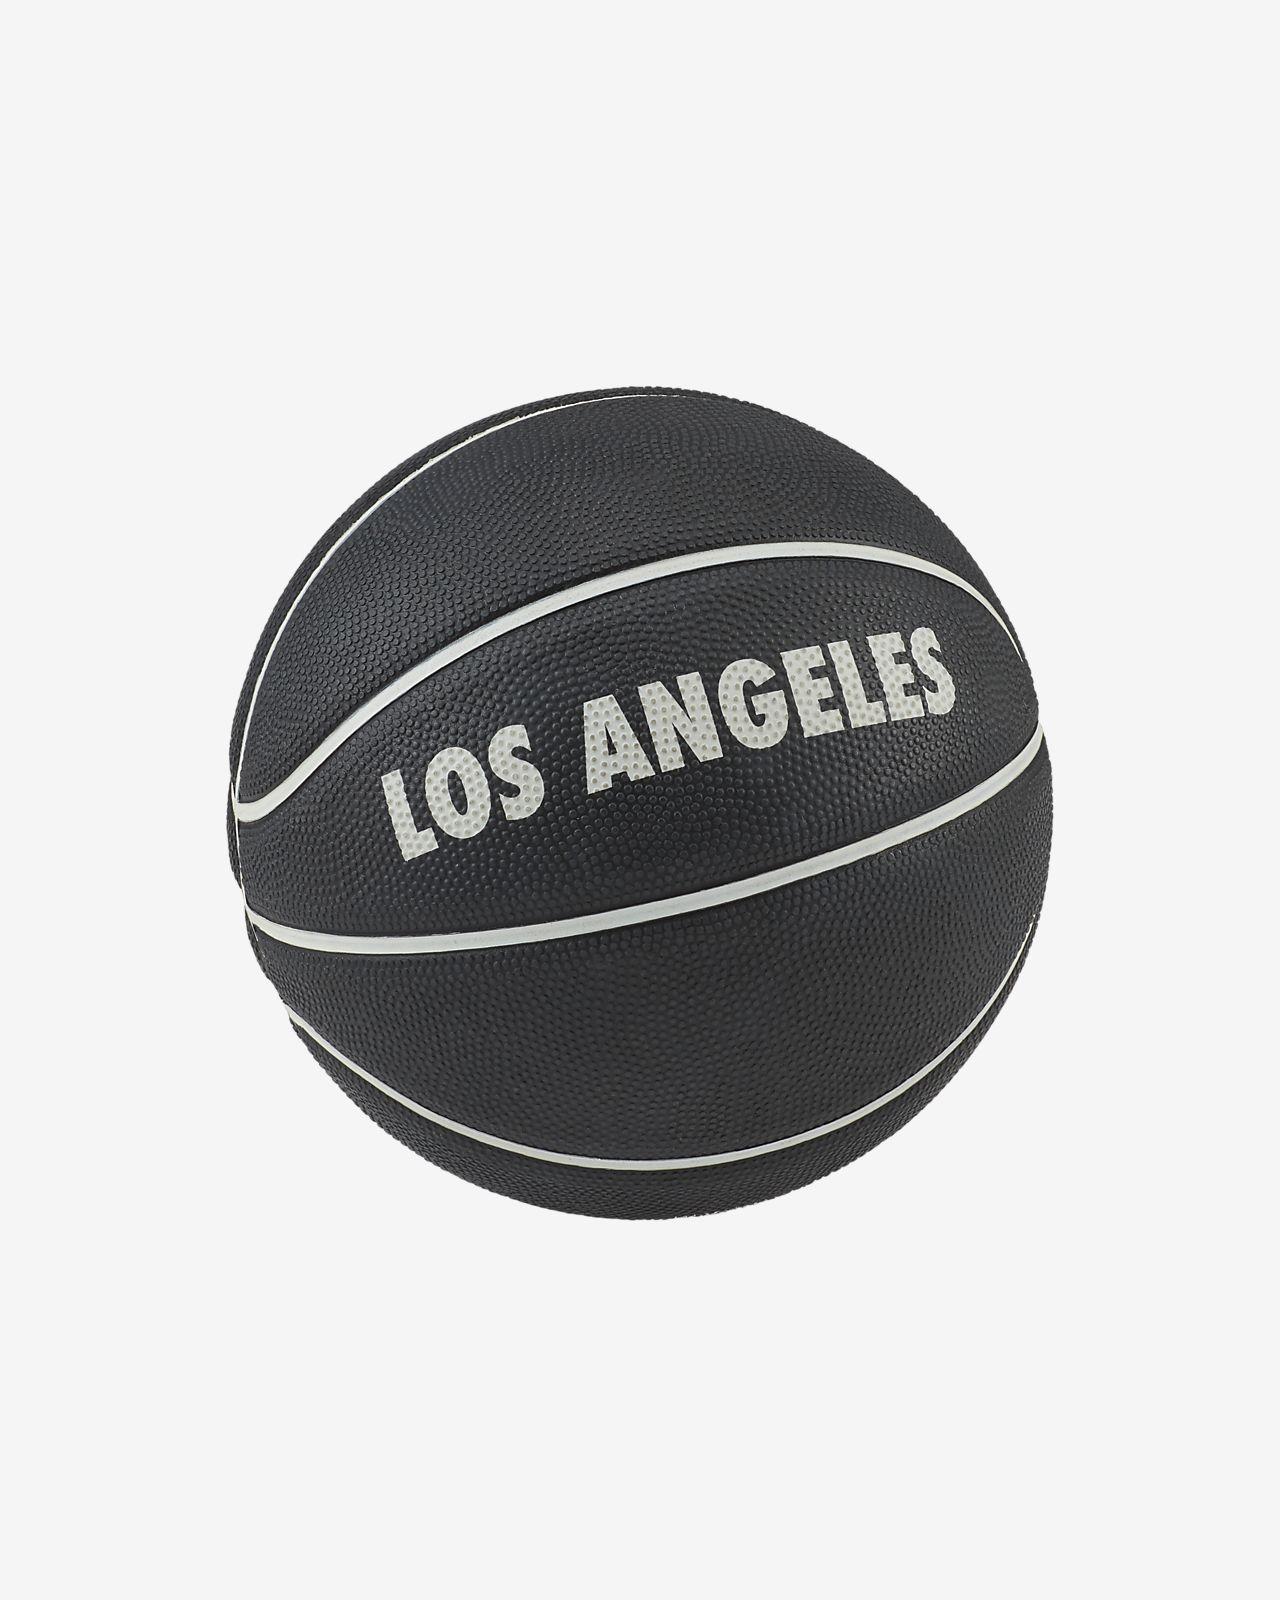 Nike Skills Basketball (Los Angeles)